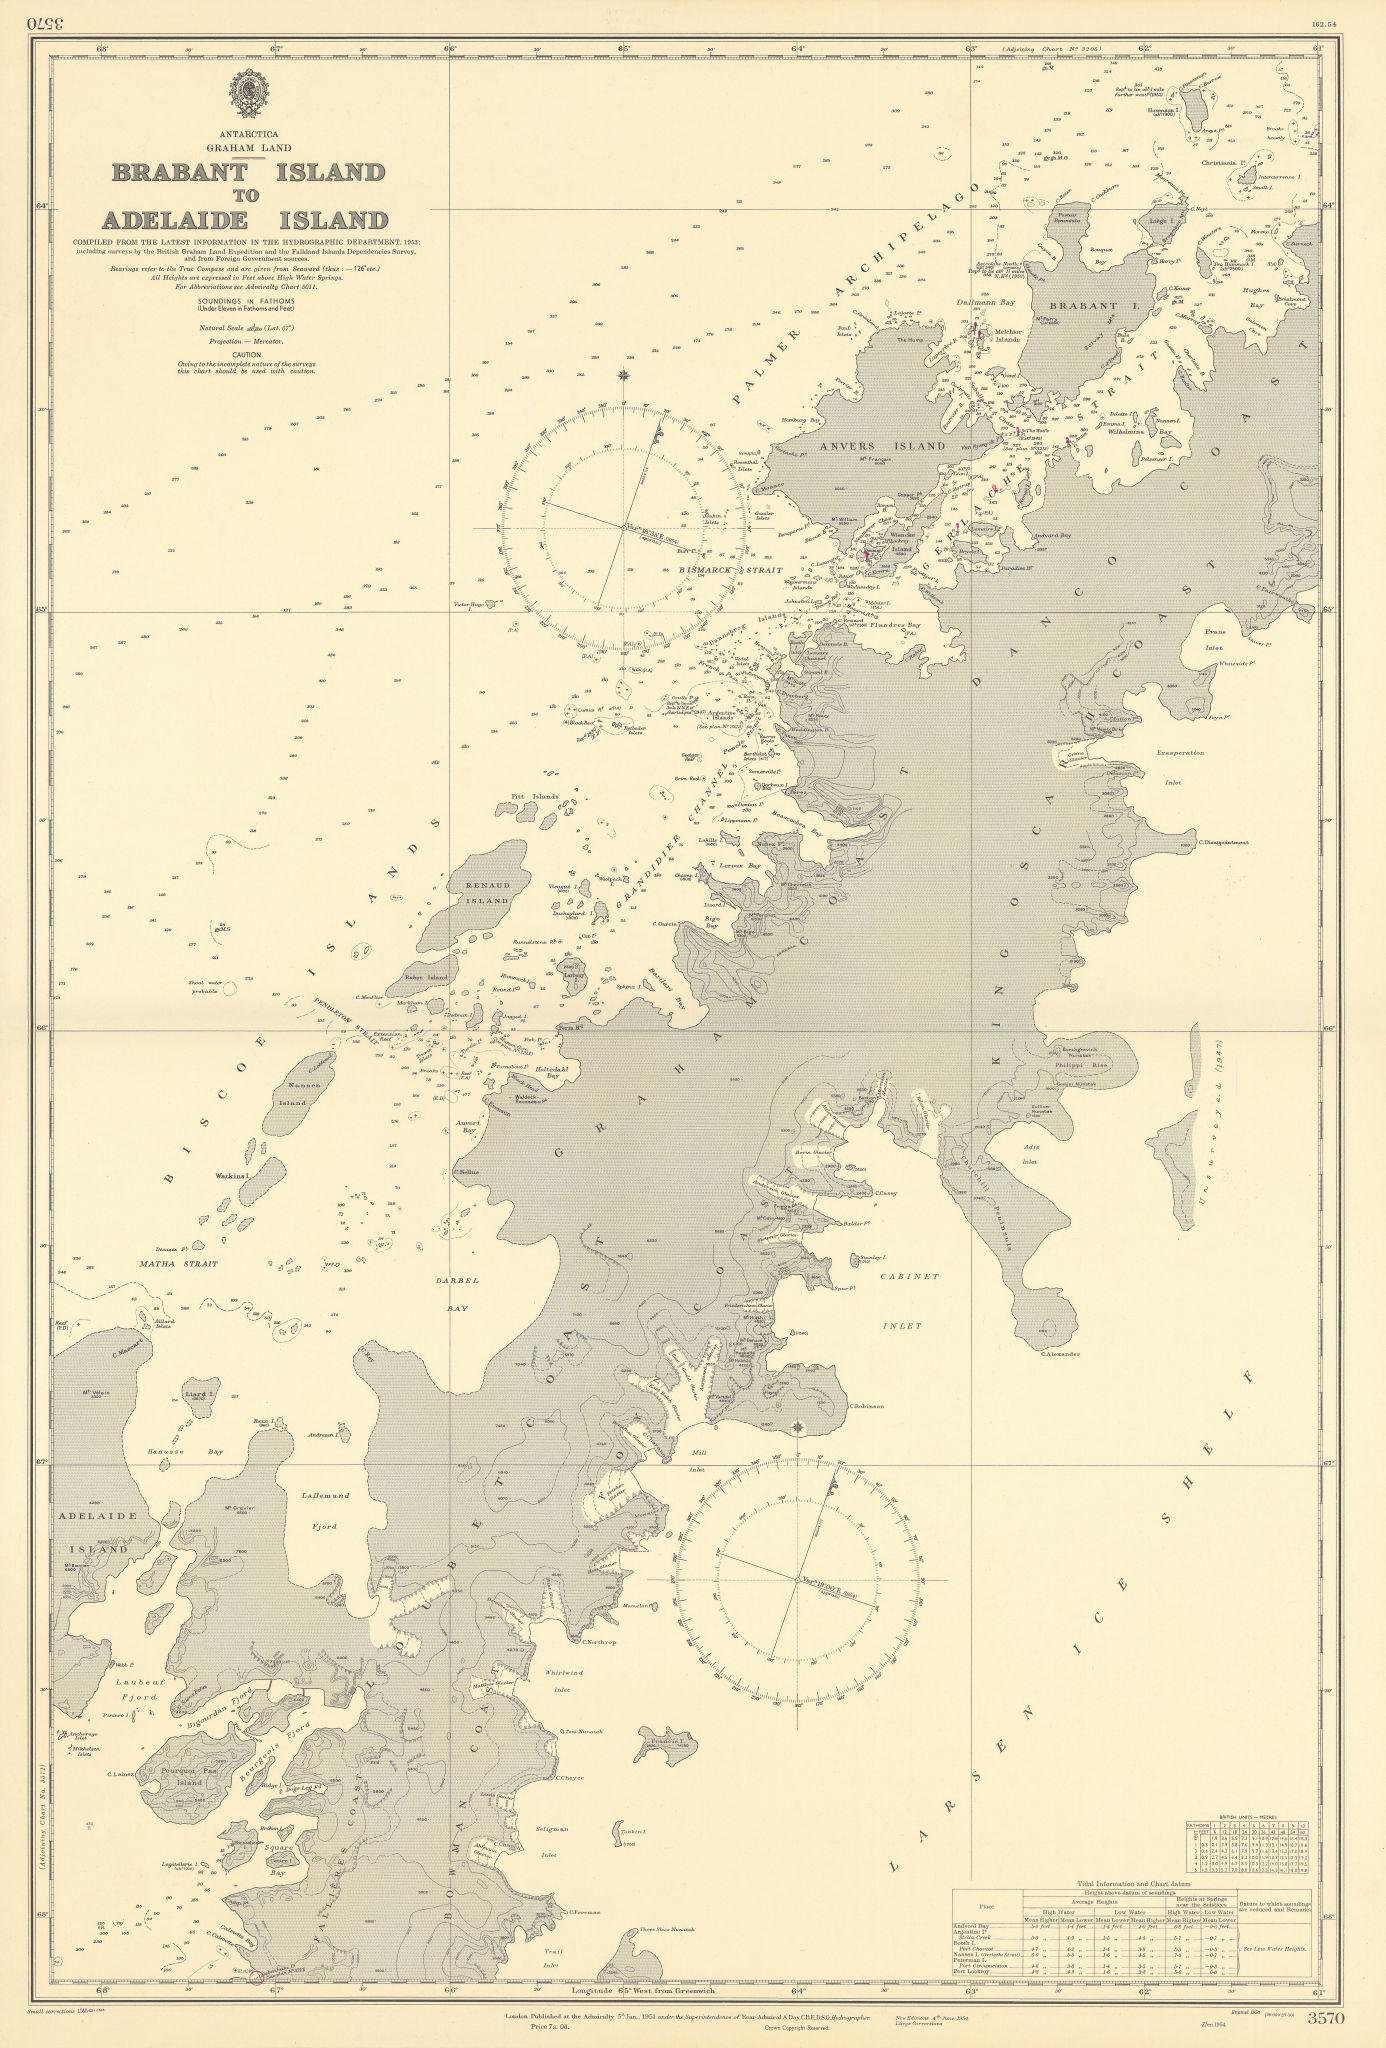 Antarctica Graham Land Brabant-Adelaide Island ADMIRALTY chart 1951 (1955) map